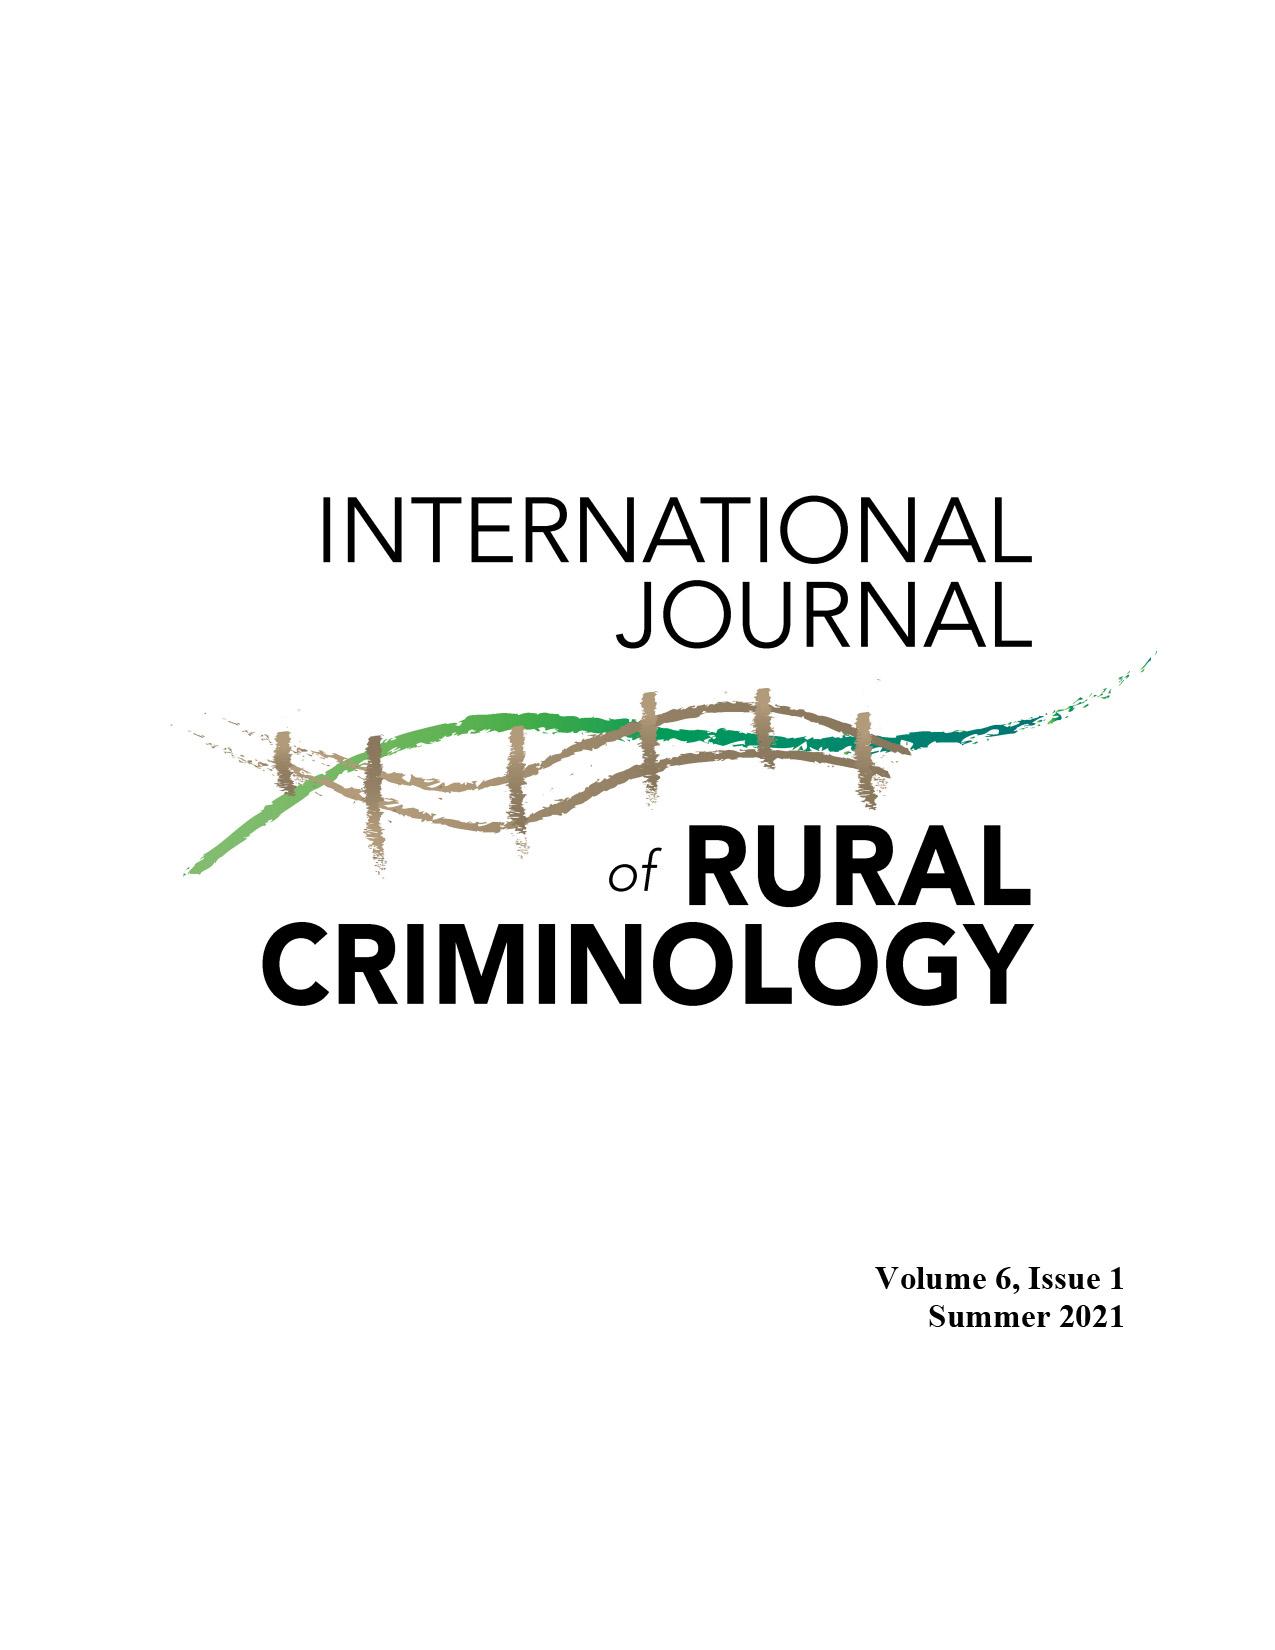 International Journal of Rural Criminology, Volume 6, Issue 1, Summer 2021